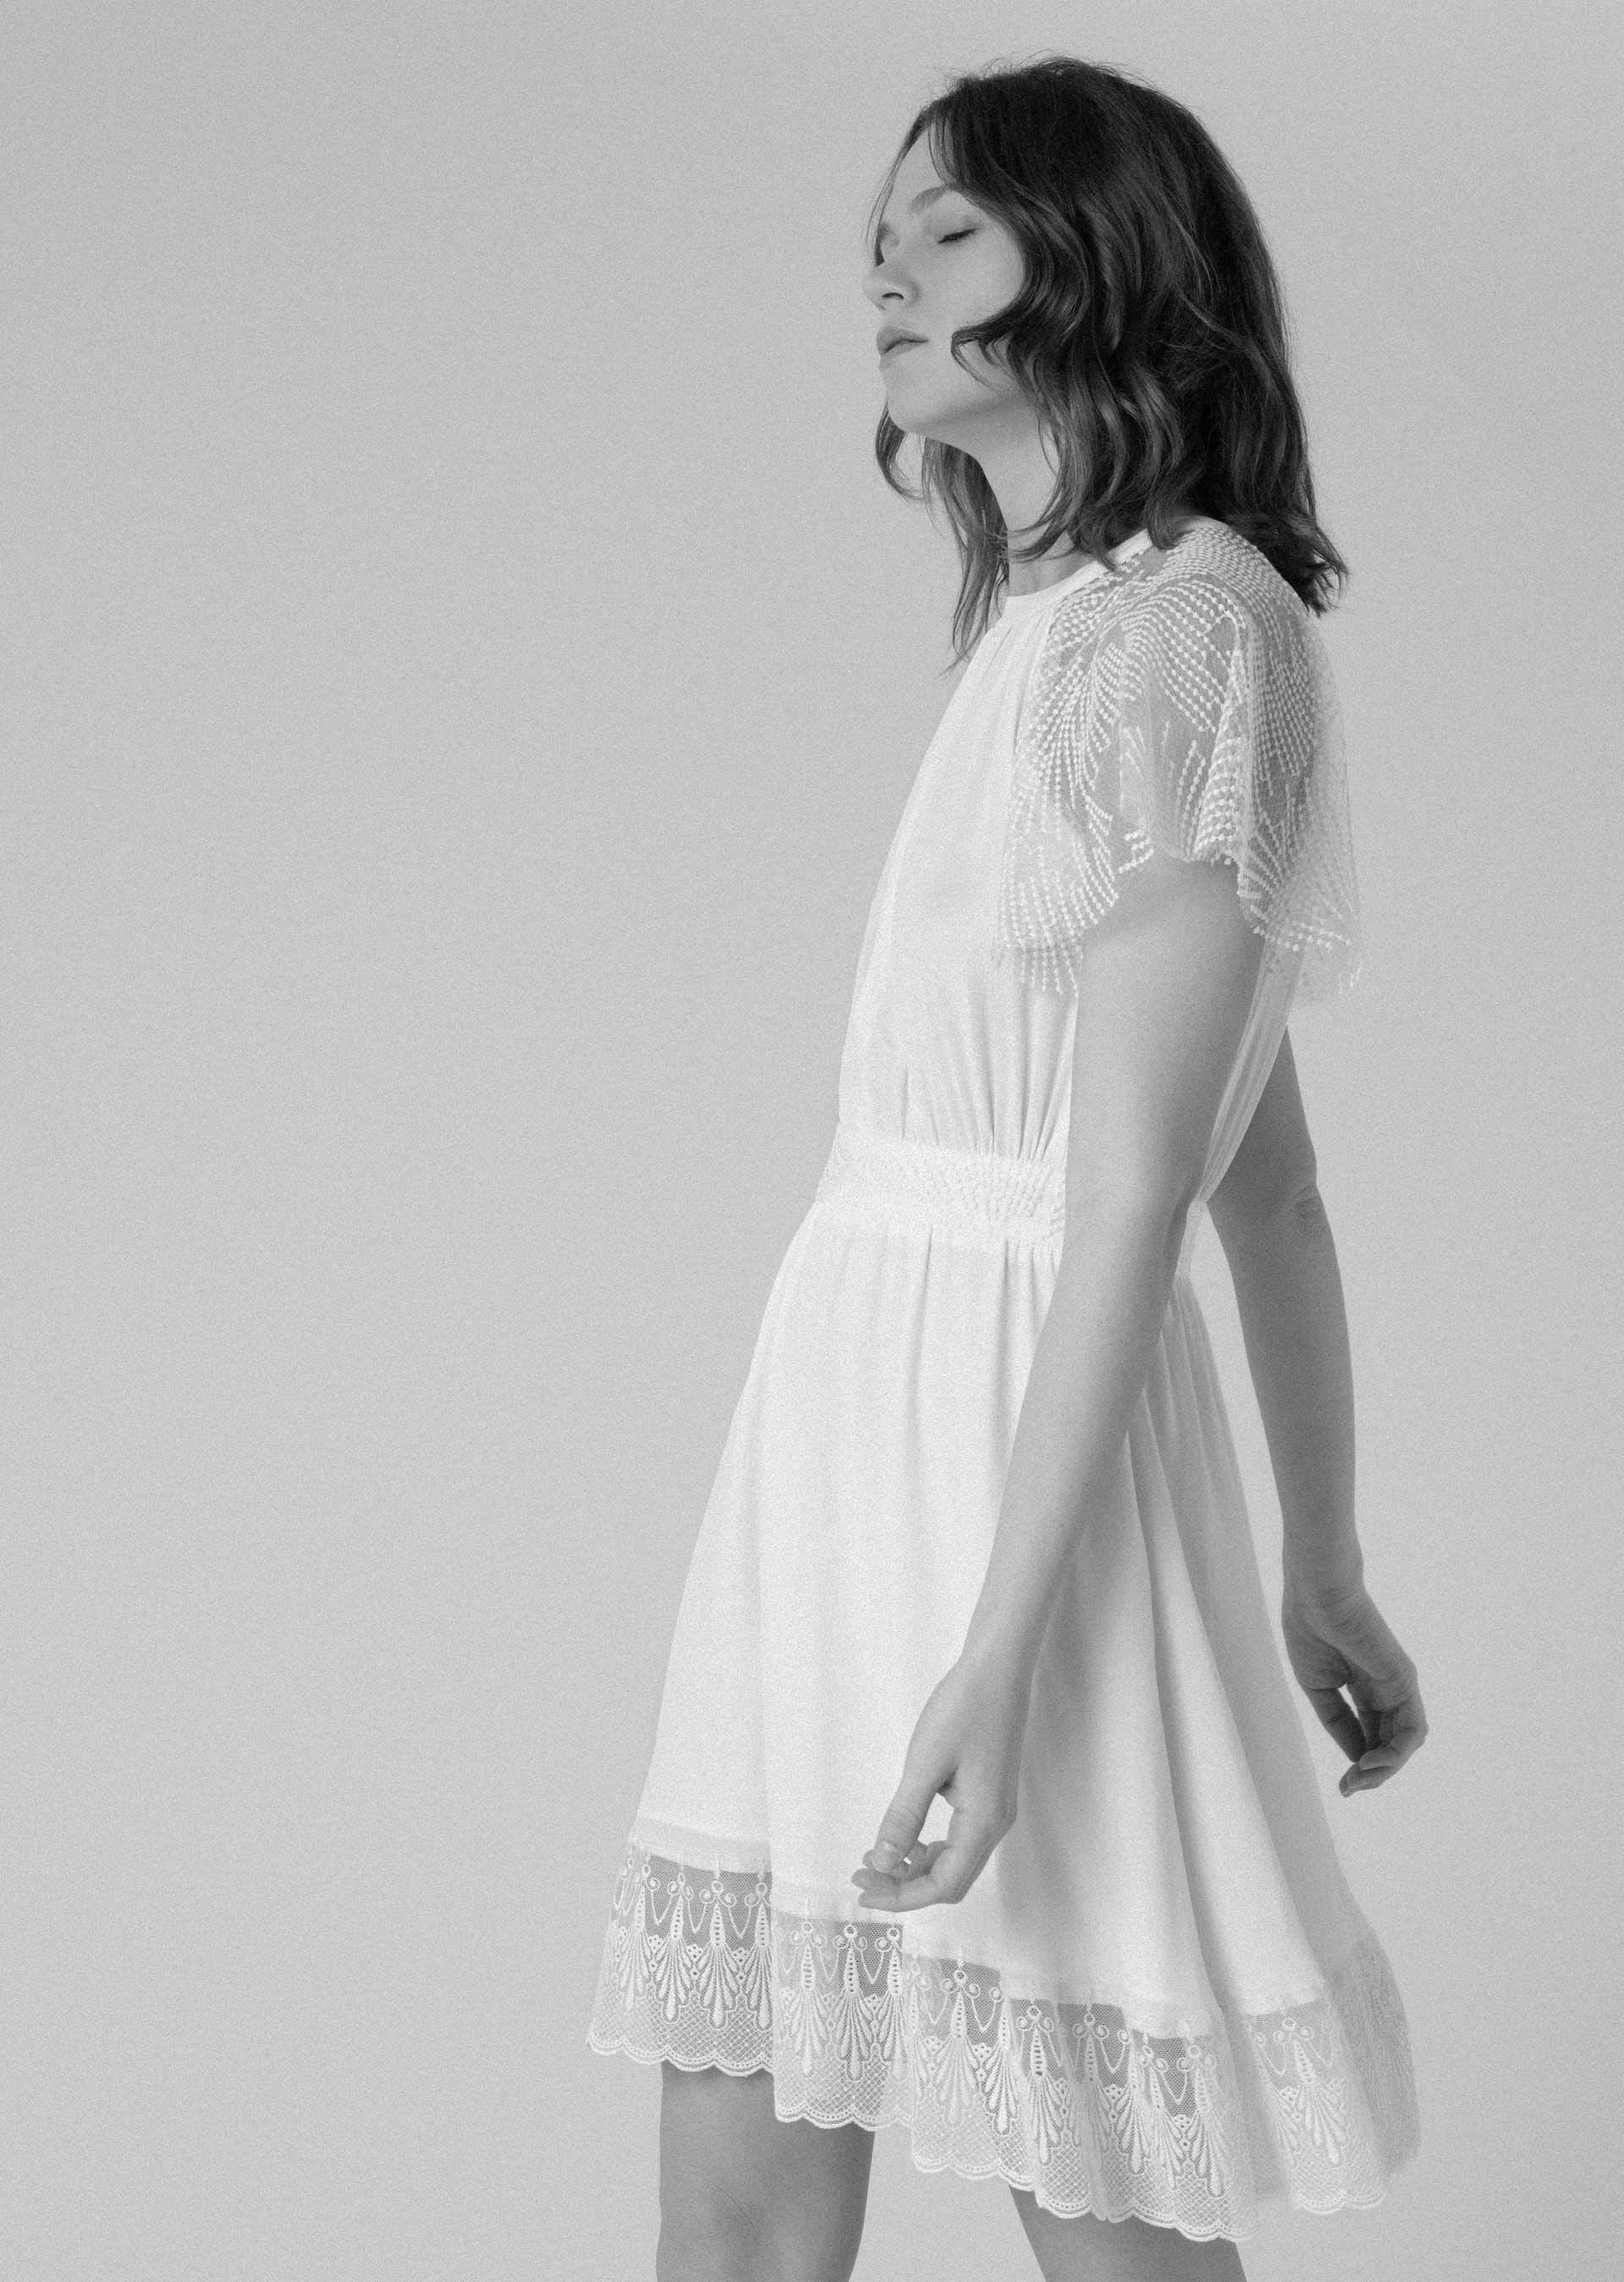 Alex favourite robe white dream sessùn oui robes